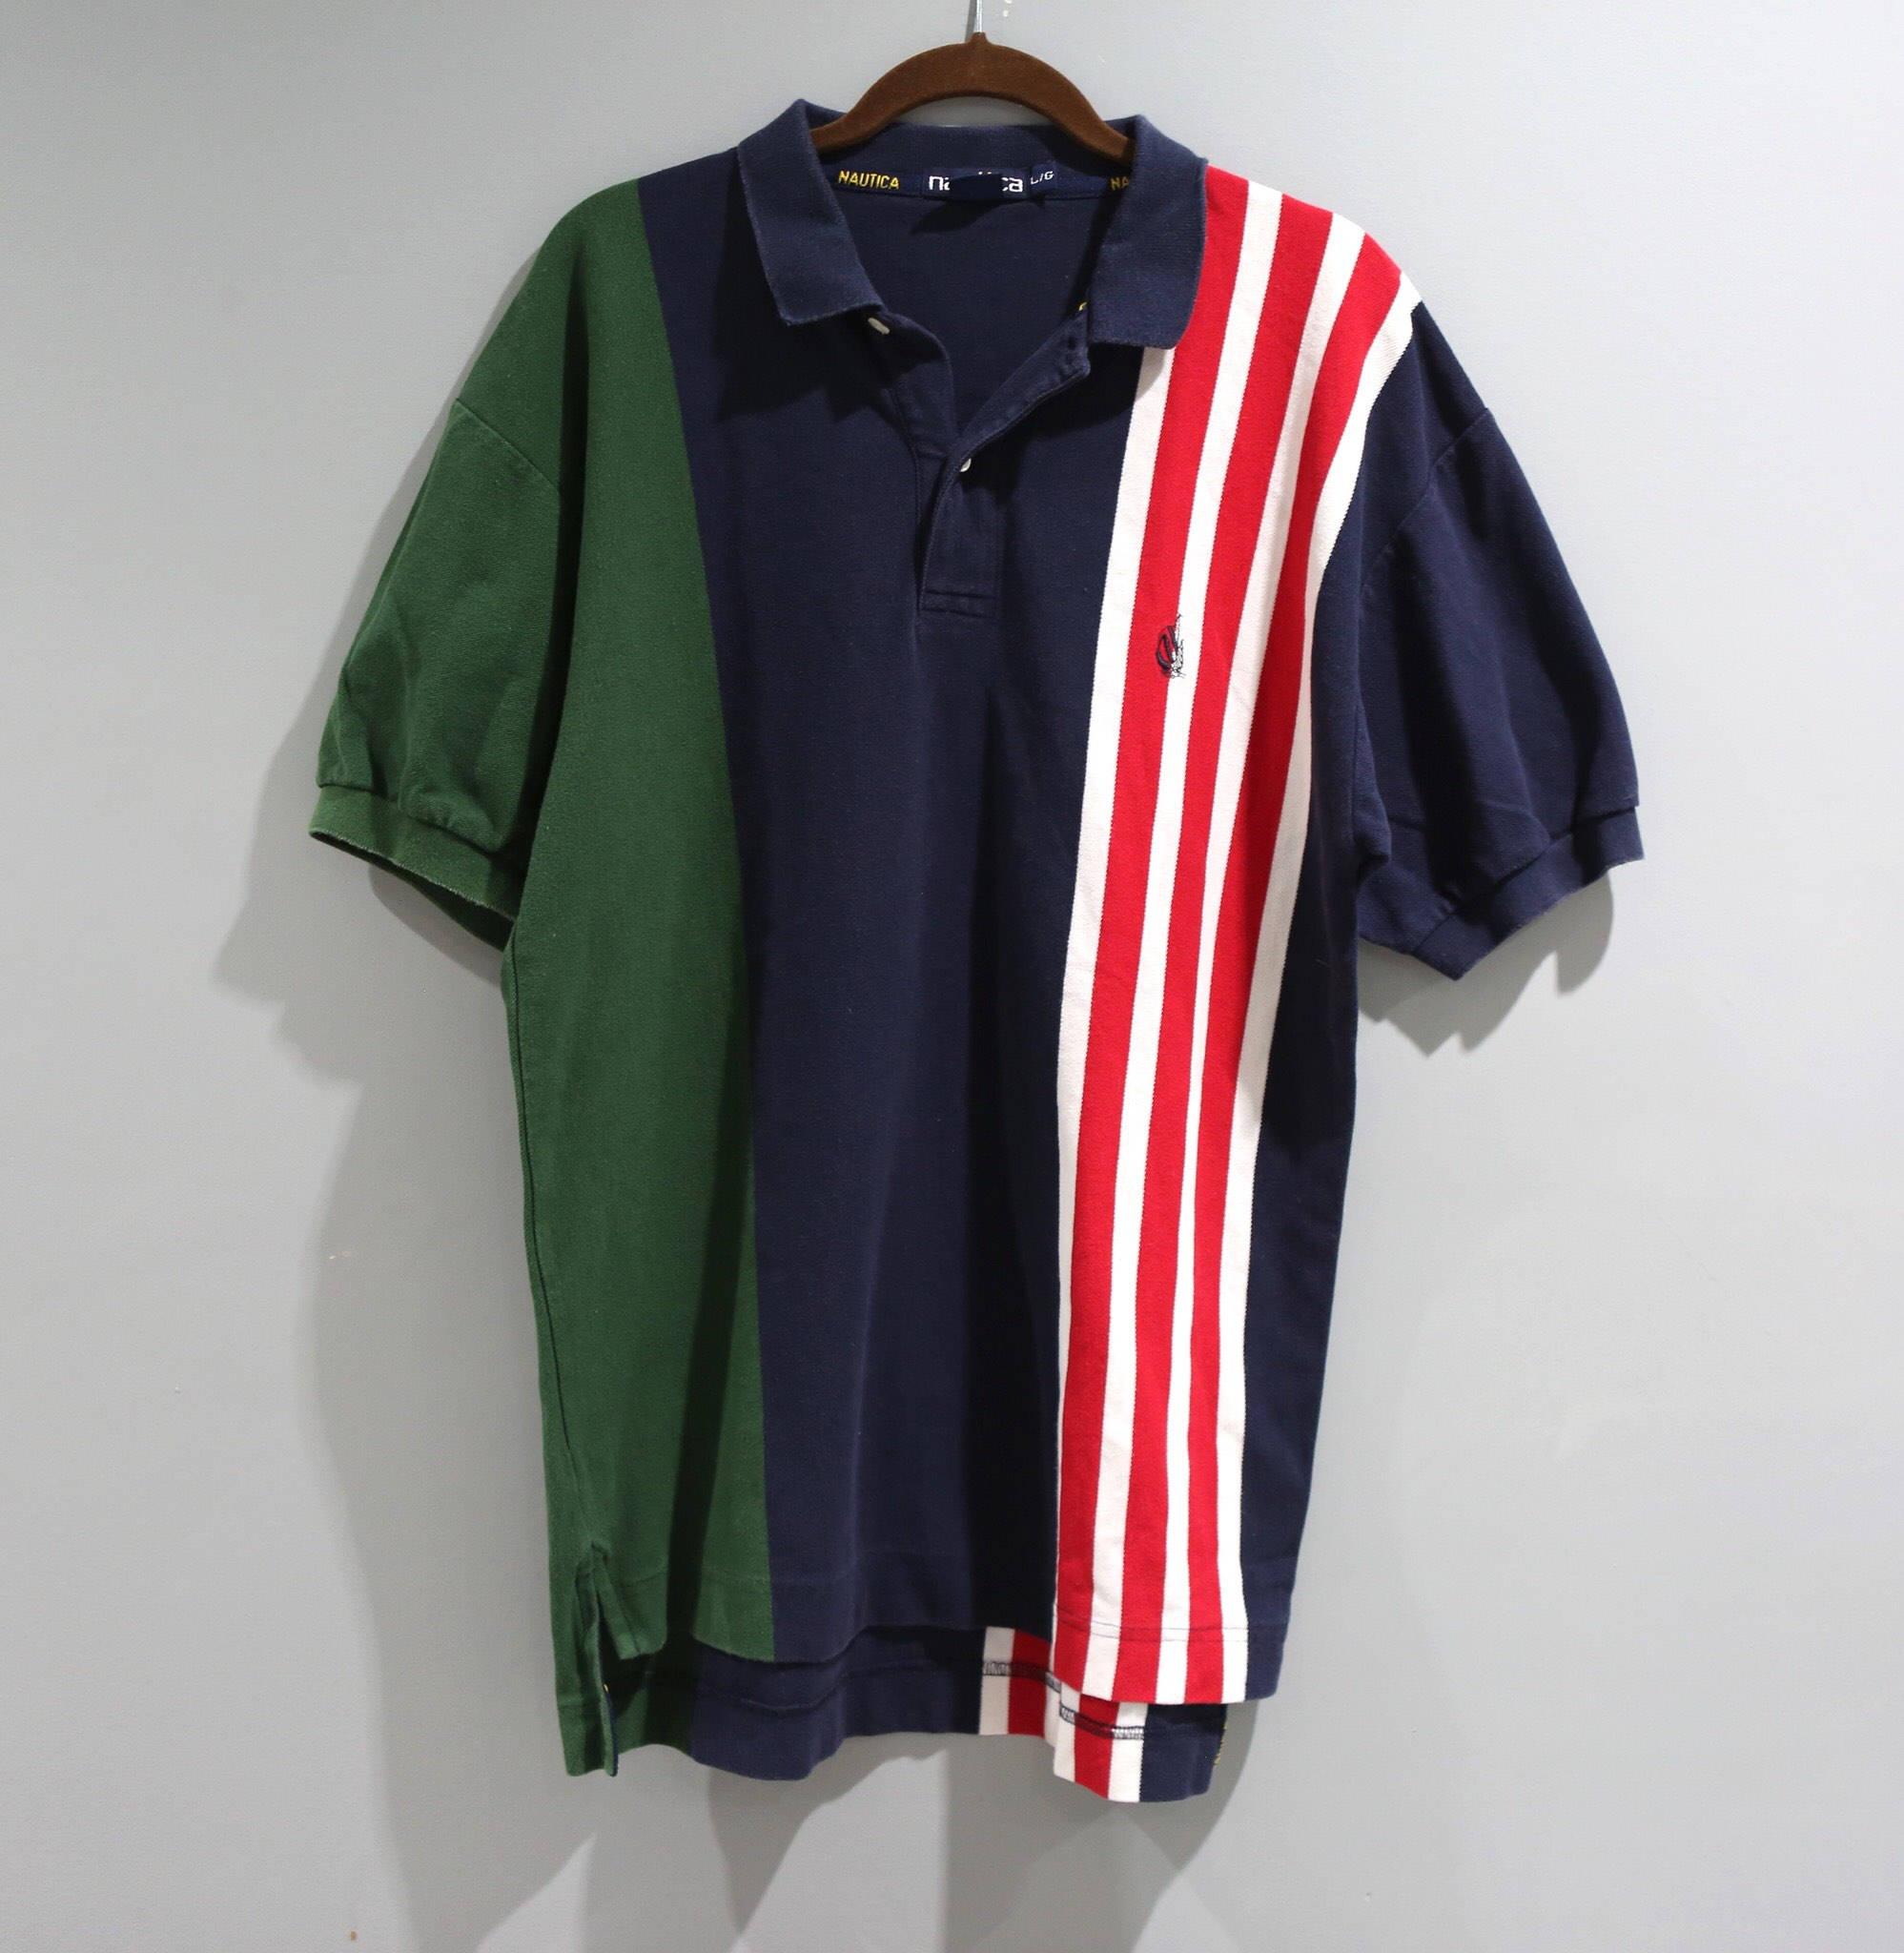 Vintage Nautica Shirt Mens Size Large L Short Sleeve Polo 90s Etsy